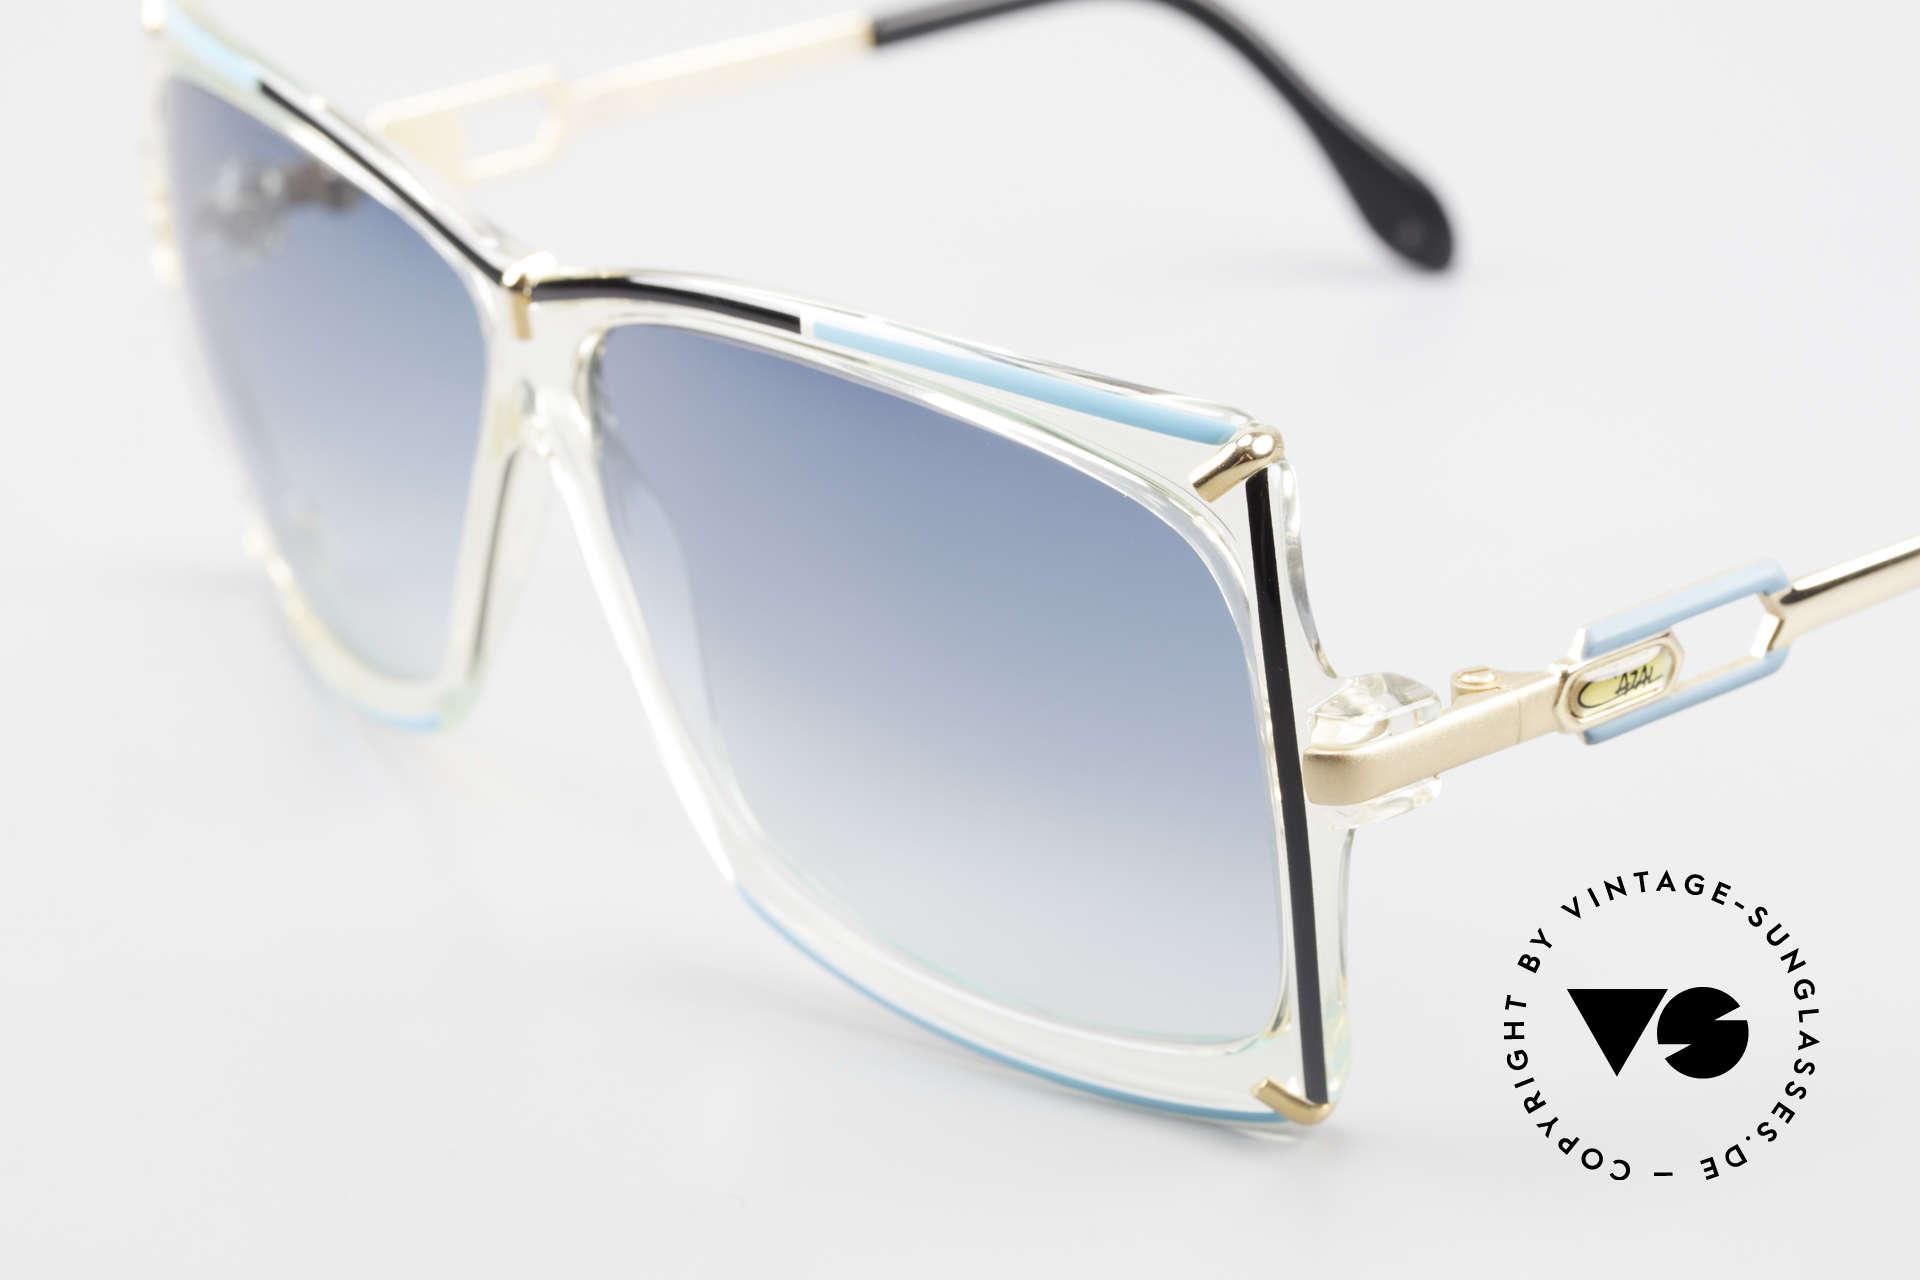 Cazal 864 Rare 80's Cazal XL Sunglasses, made around 1986 in Passau, Bavaria (W.Germany), Made for Women